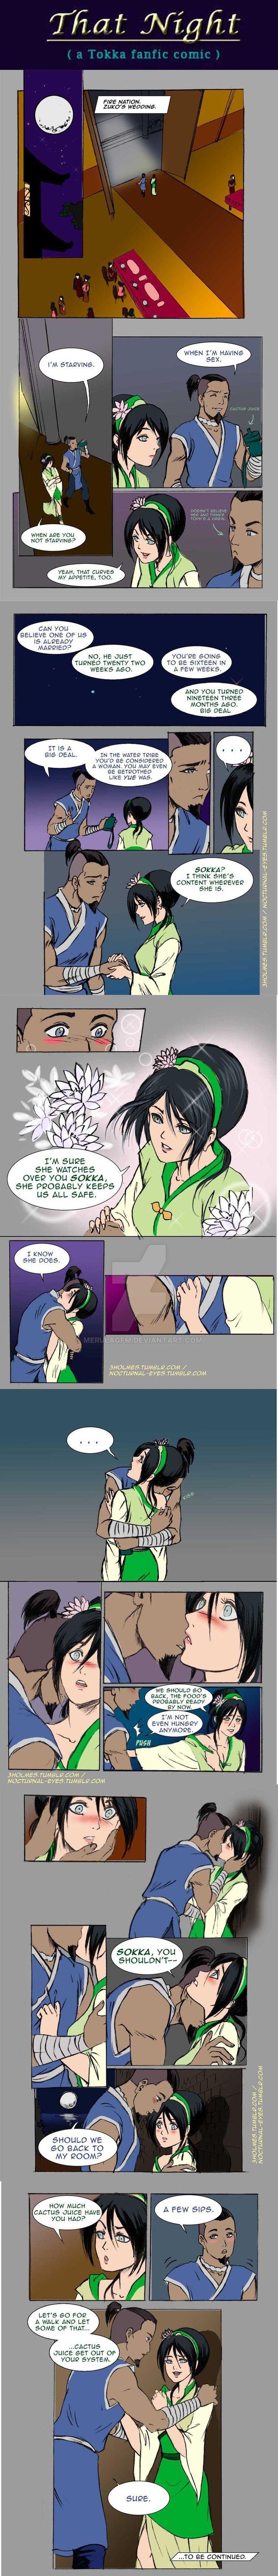 Avatar Legend Of Korra Nobu Porn - A Tokka FanFic Comic - THAT NIGHT, PART 01